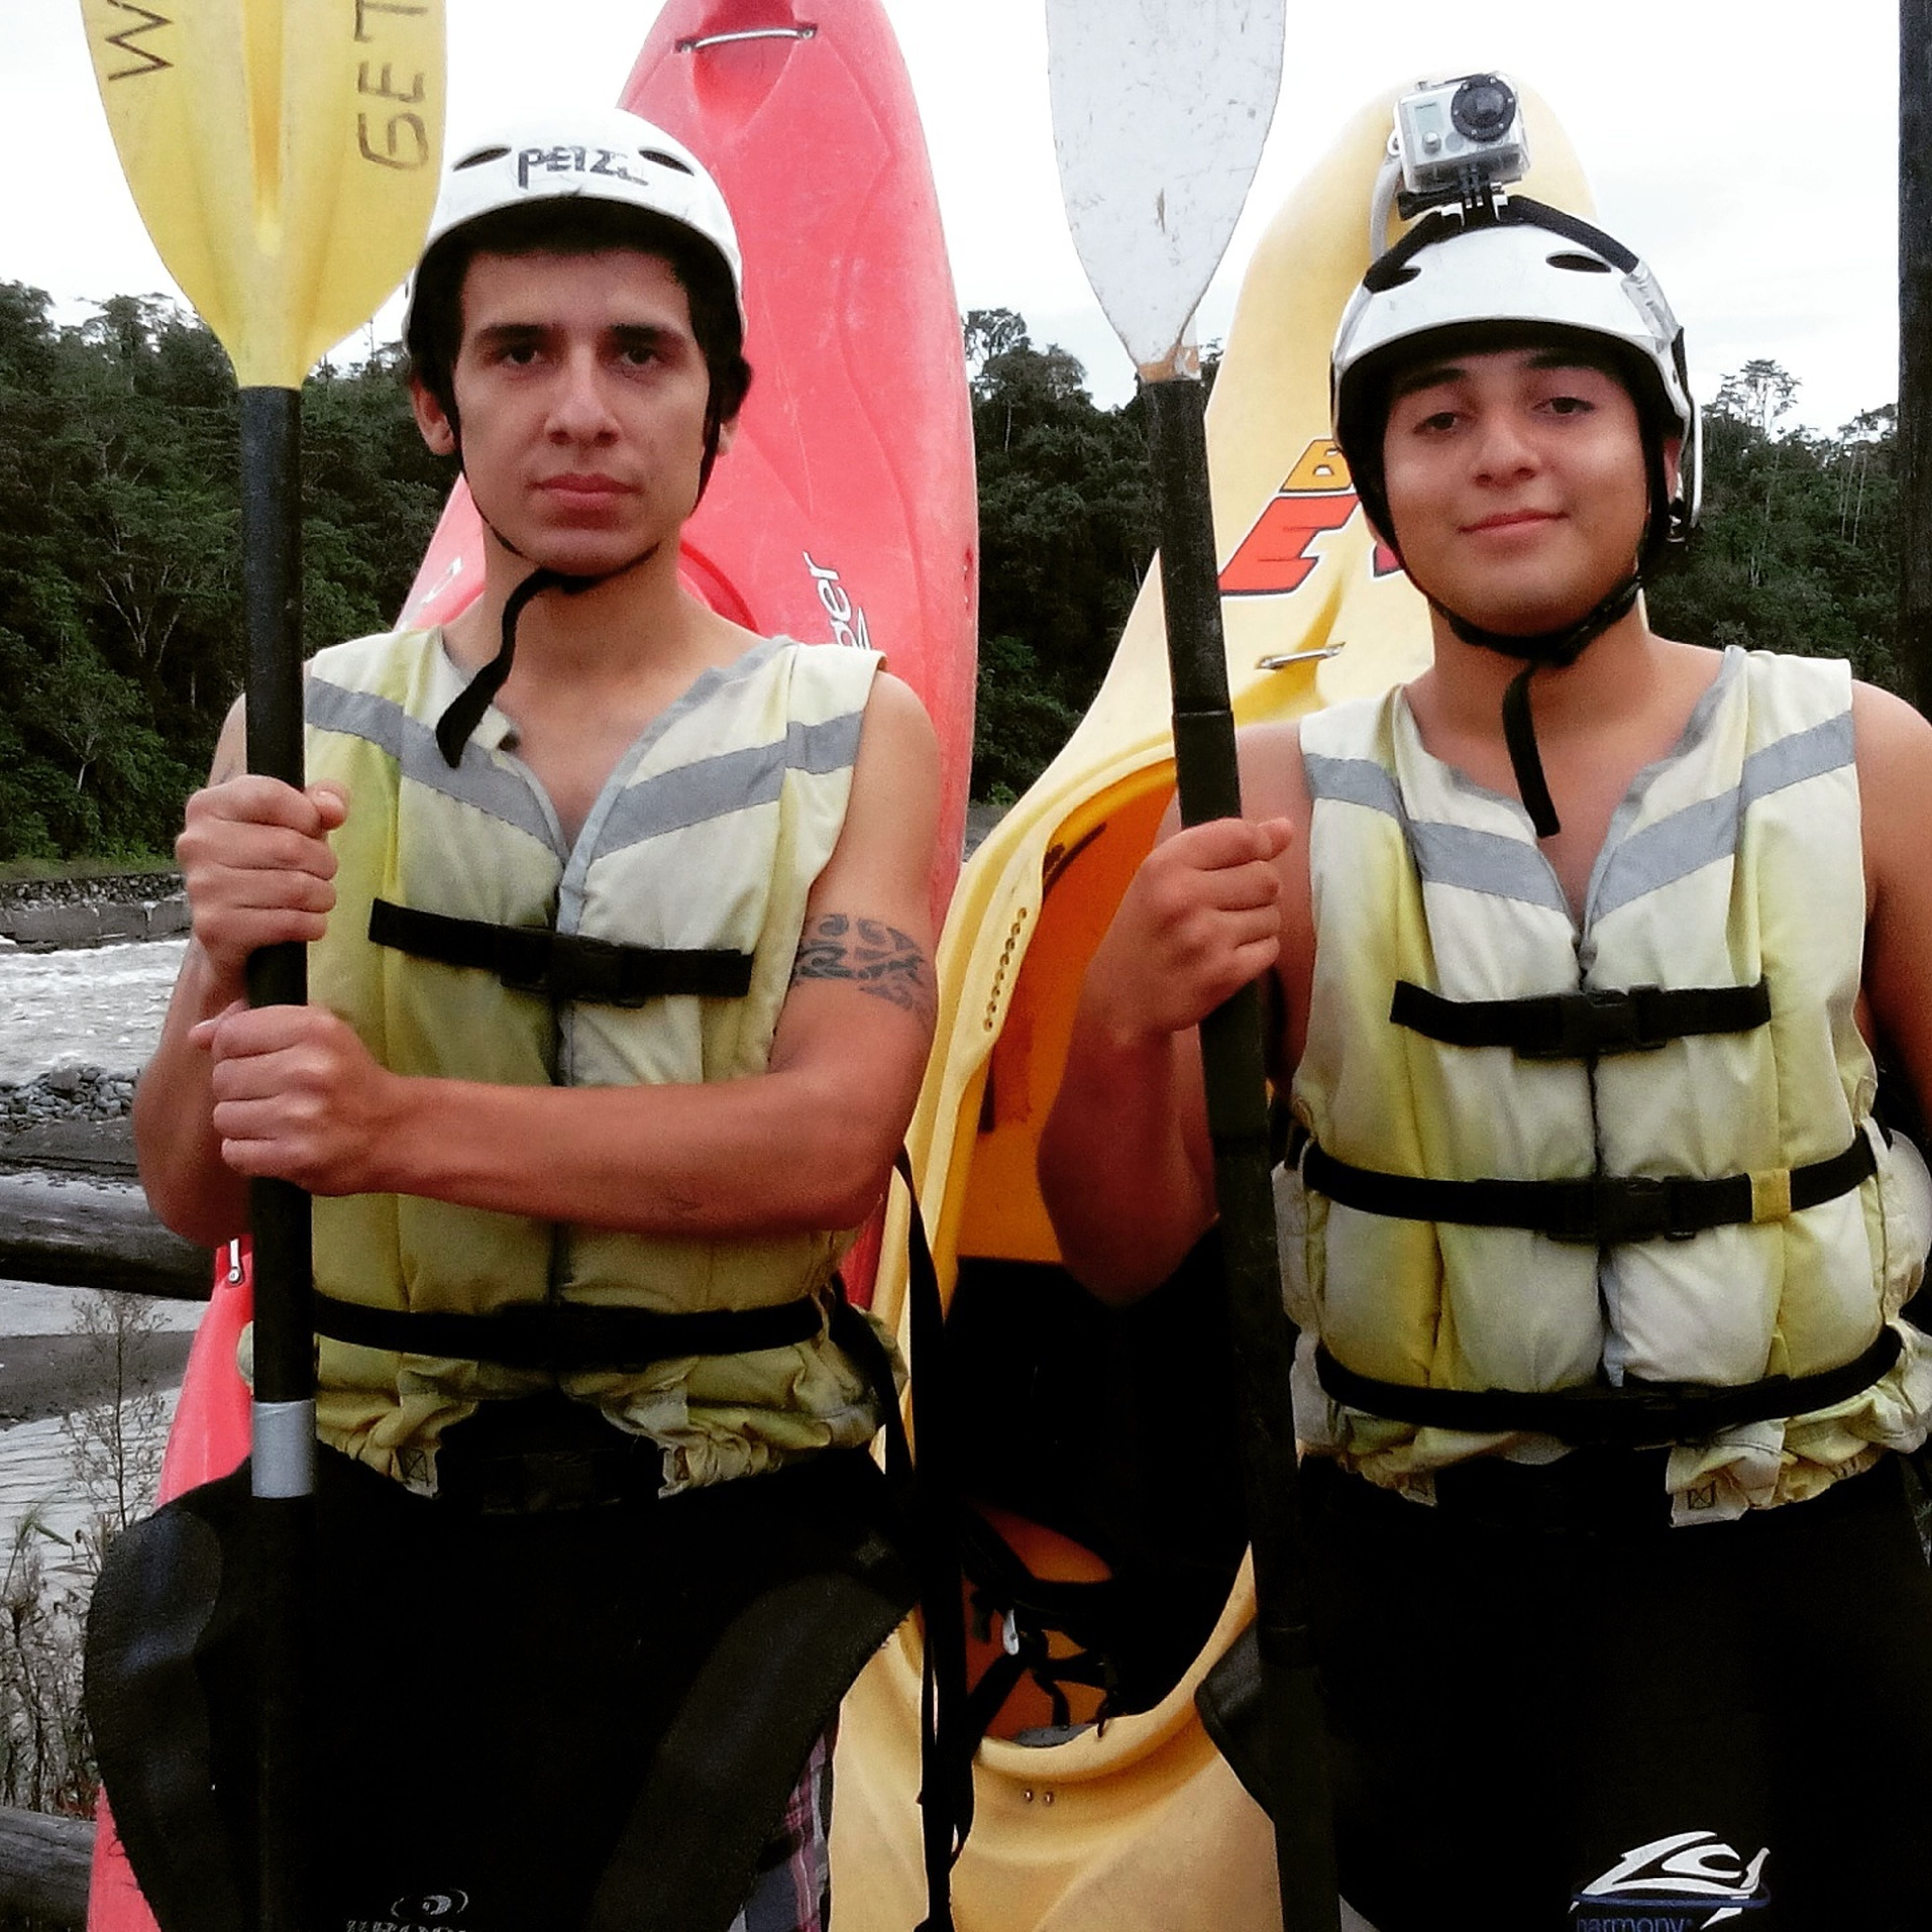 Kayak, asados y amigos! Watersports